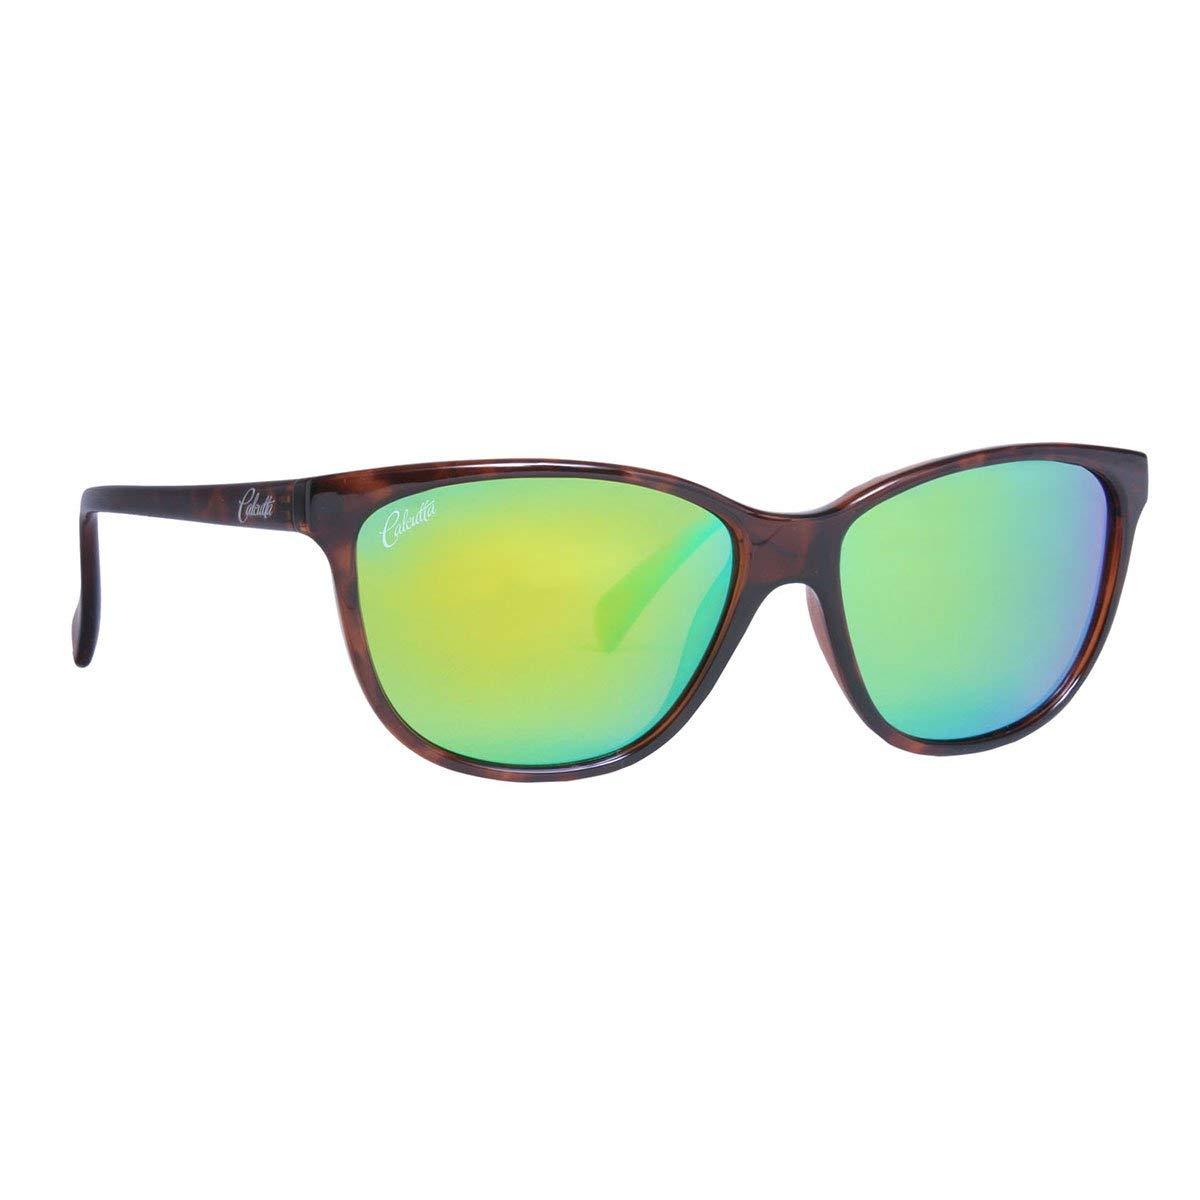 Calcutta Tortola Original Series Fishing Sunglasses – Ladies Polarized Lenses for Outdoor Sun Protection